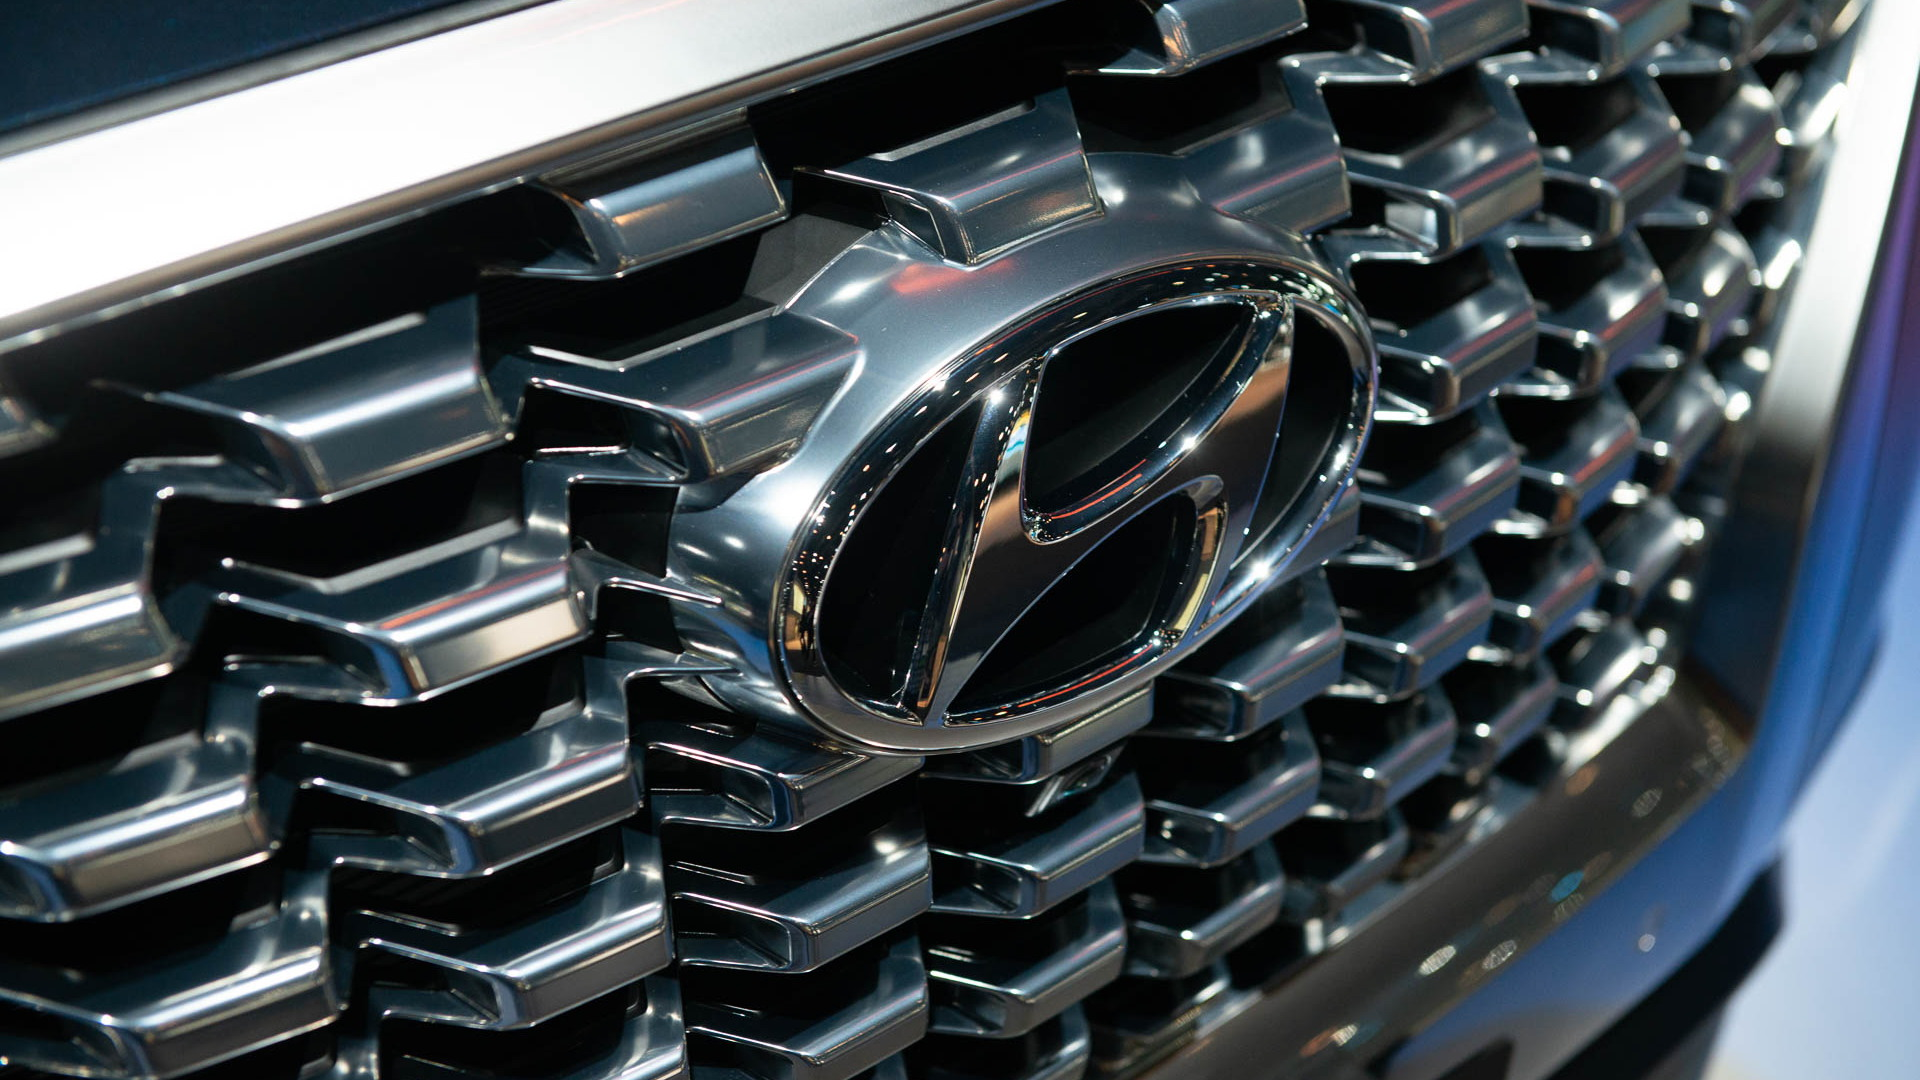 2020 Hyundai Palisade, 2018 LA Auto Show